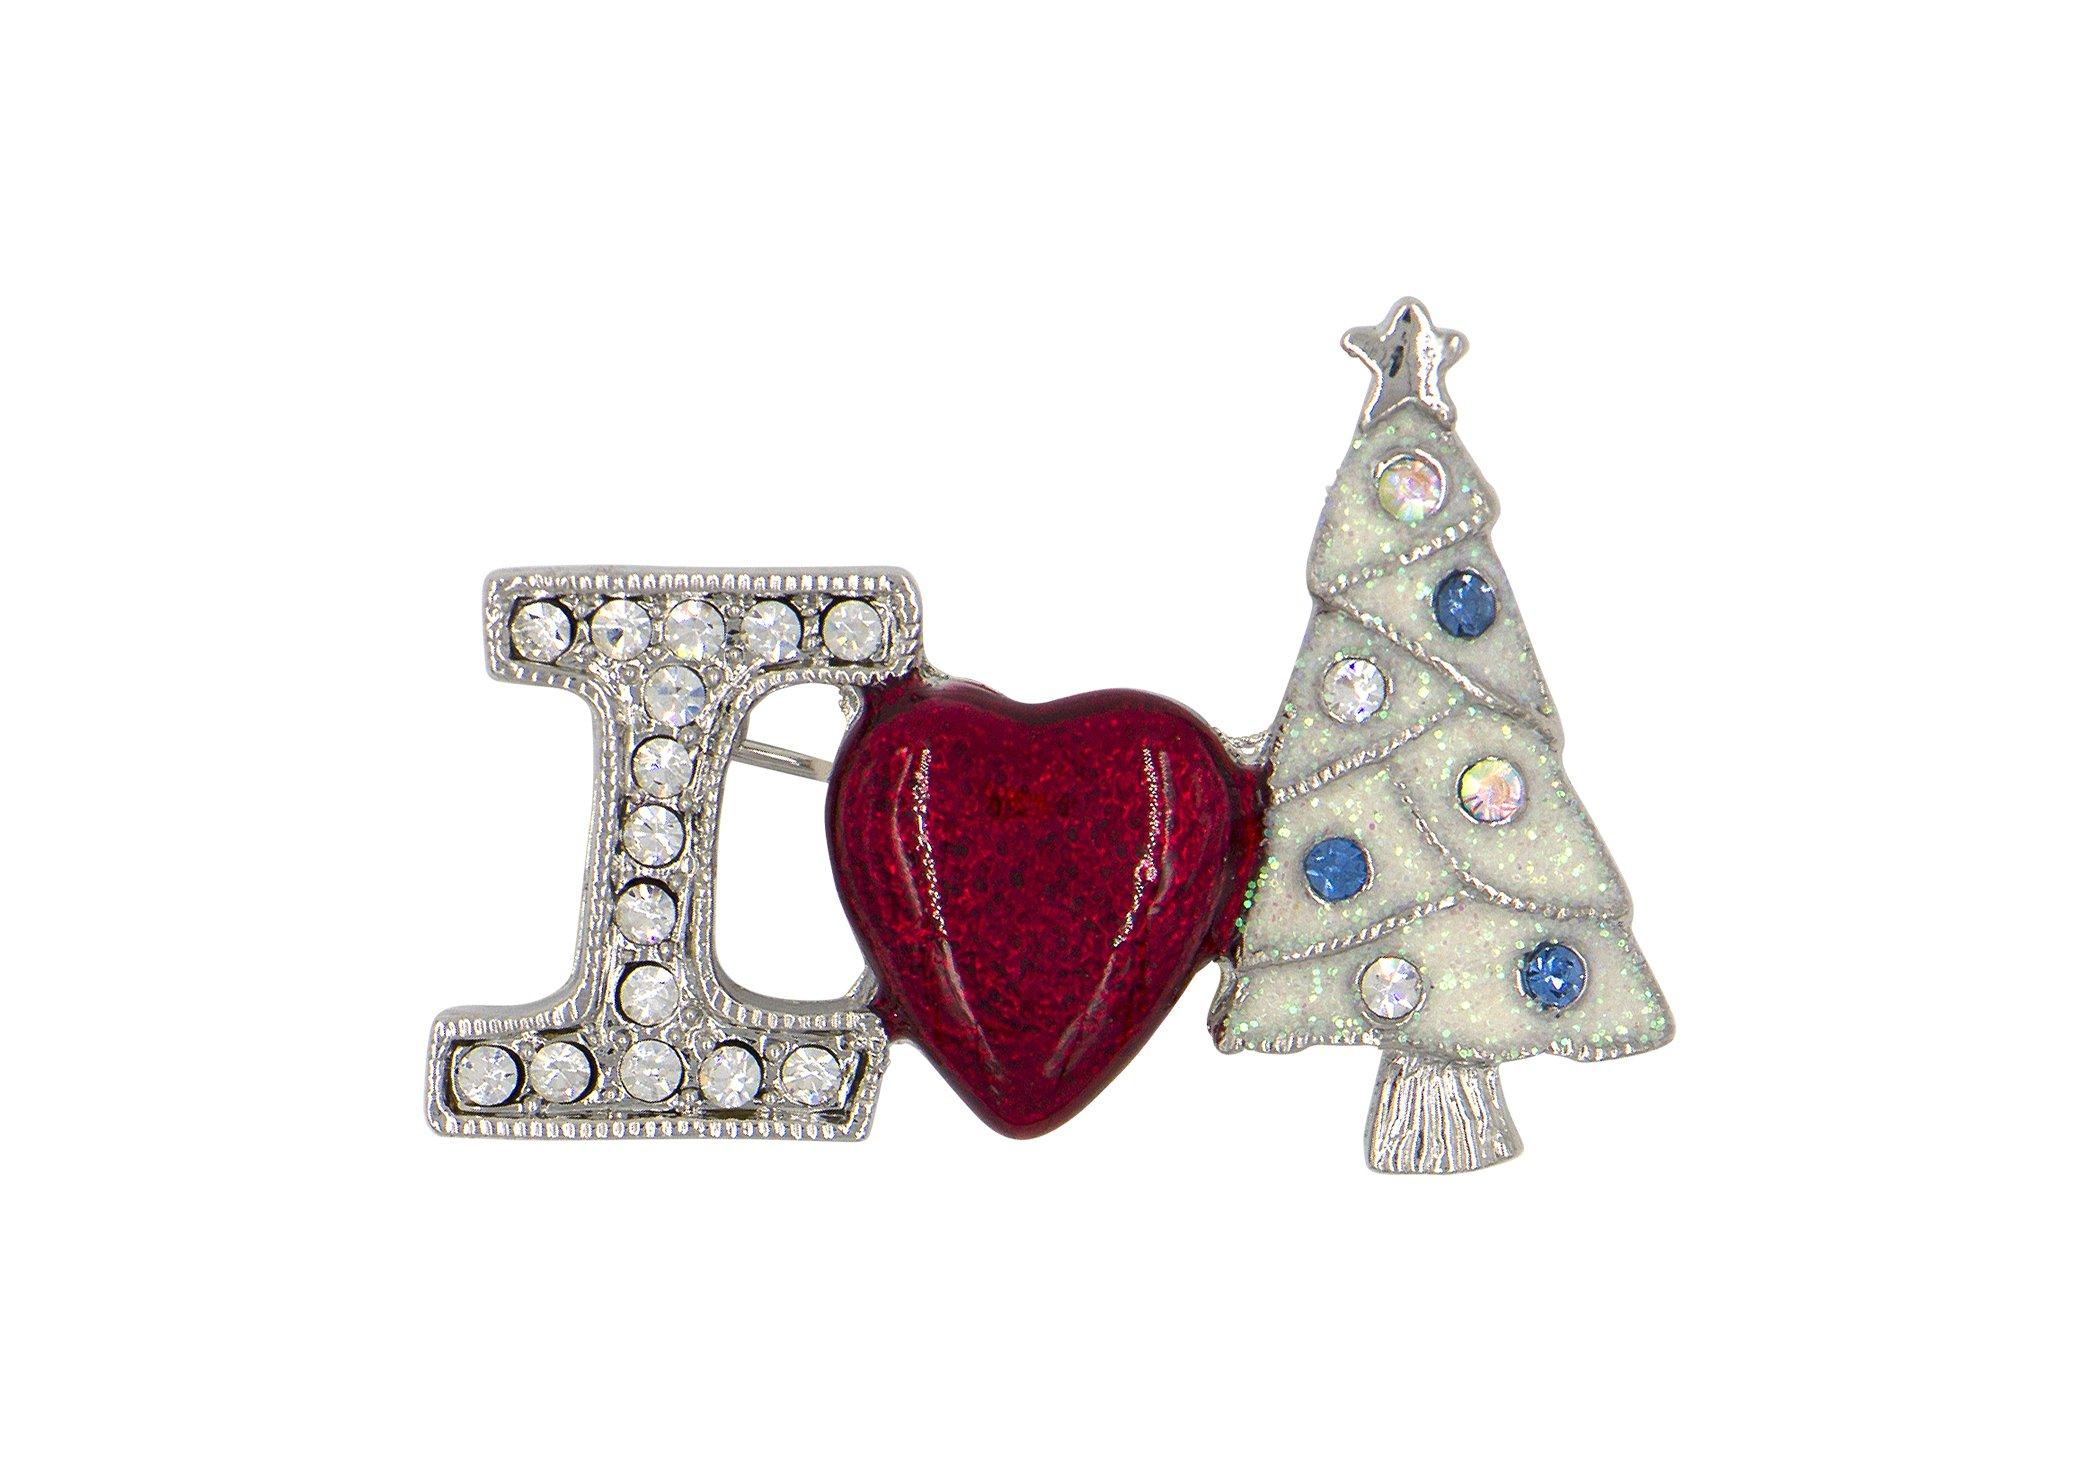 DennyBlaine & Co. Christmas Holiday Enamel Rhinestone Brooch (I Heart Christmas Snowy White)